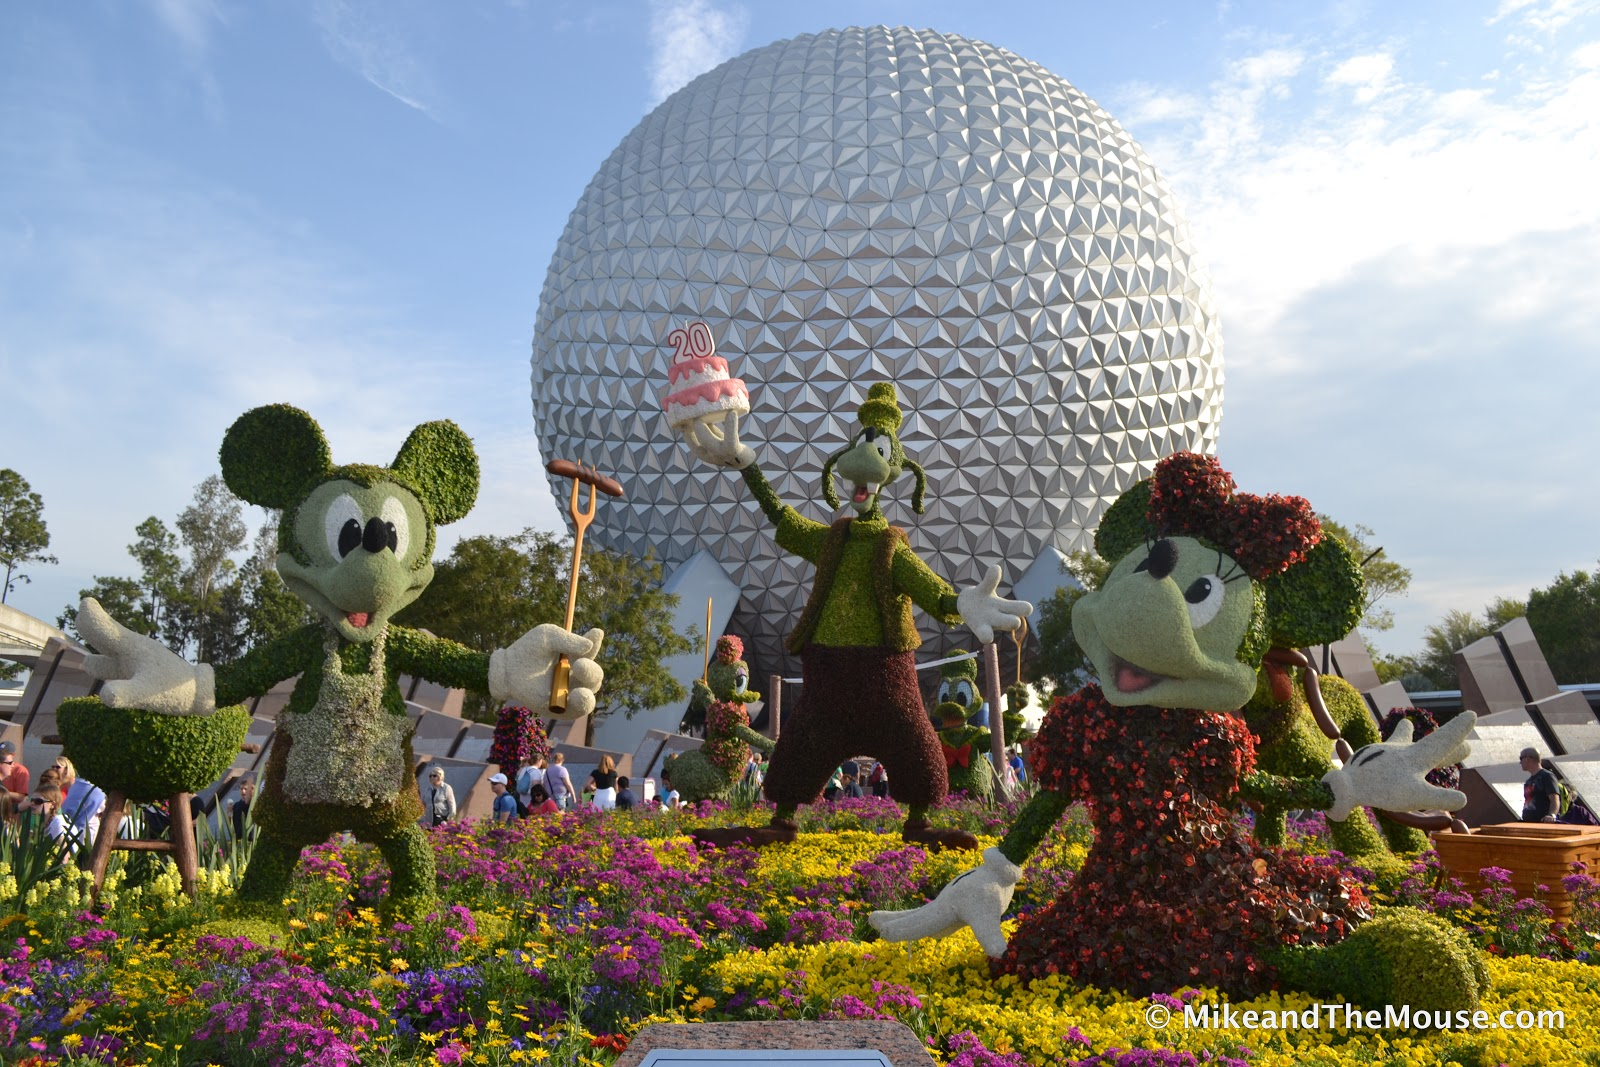 Disney Topiary Part - 48: The Art Of Topiary Gardening From Walt Disney World Resort